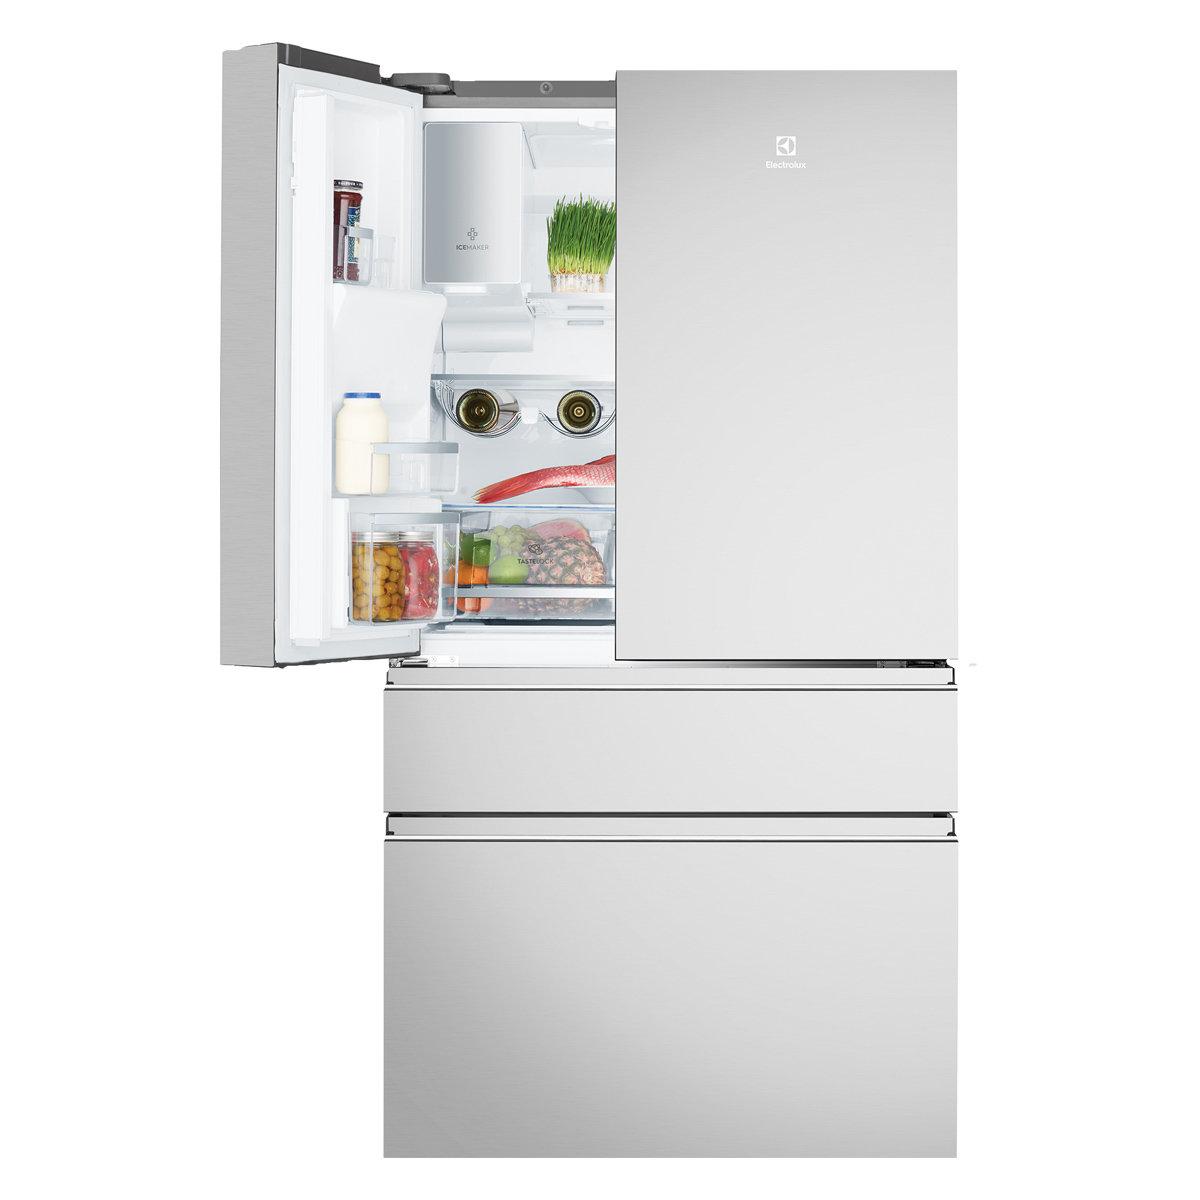 Electrolux Ehe6899sa 681l French Door Fridge Appliances Online